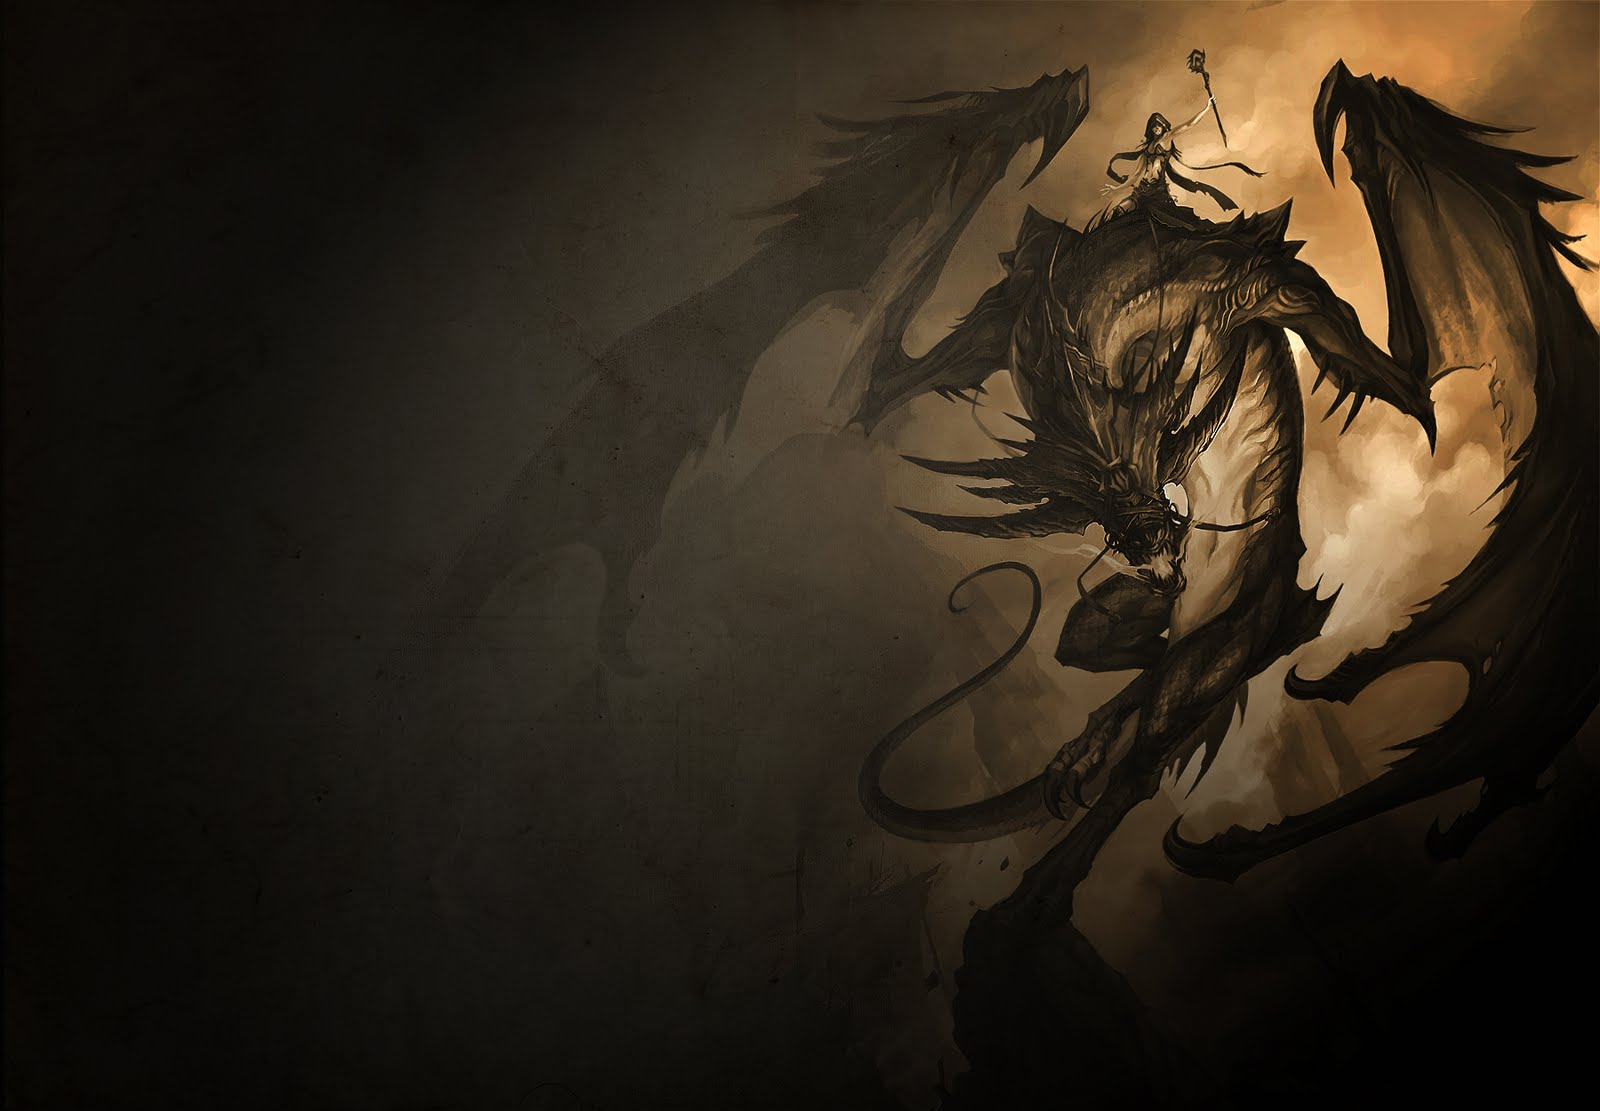 Badass Wallpapers Dragon Rider 1600x1111